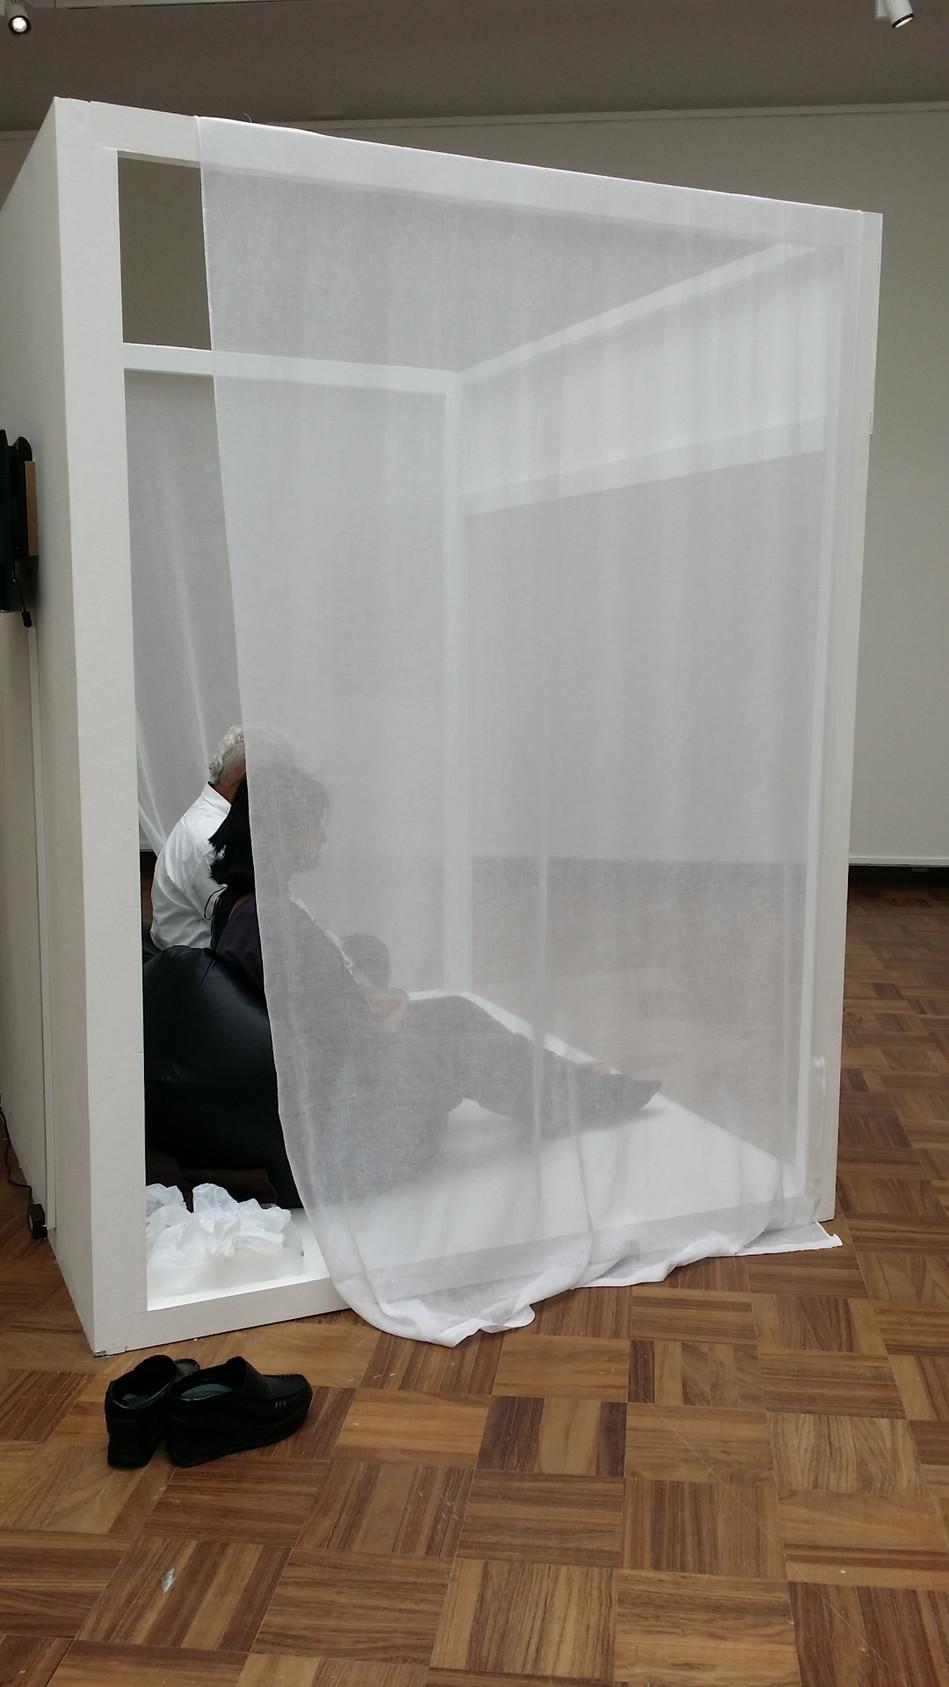 Installation Performance